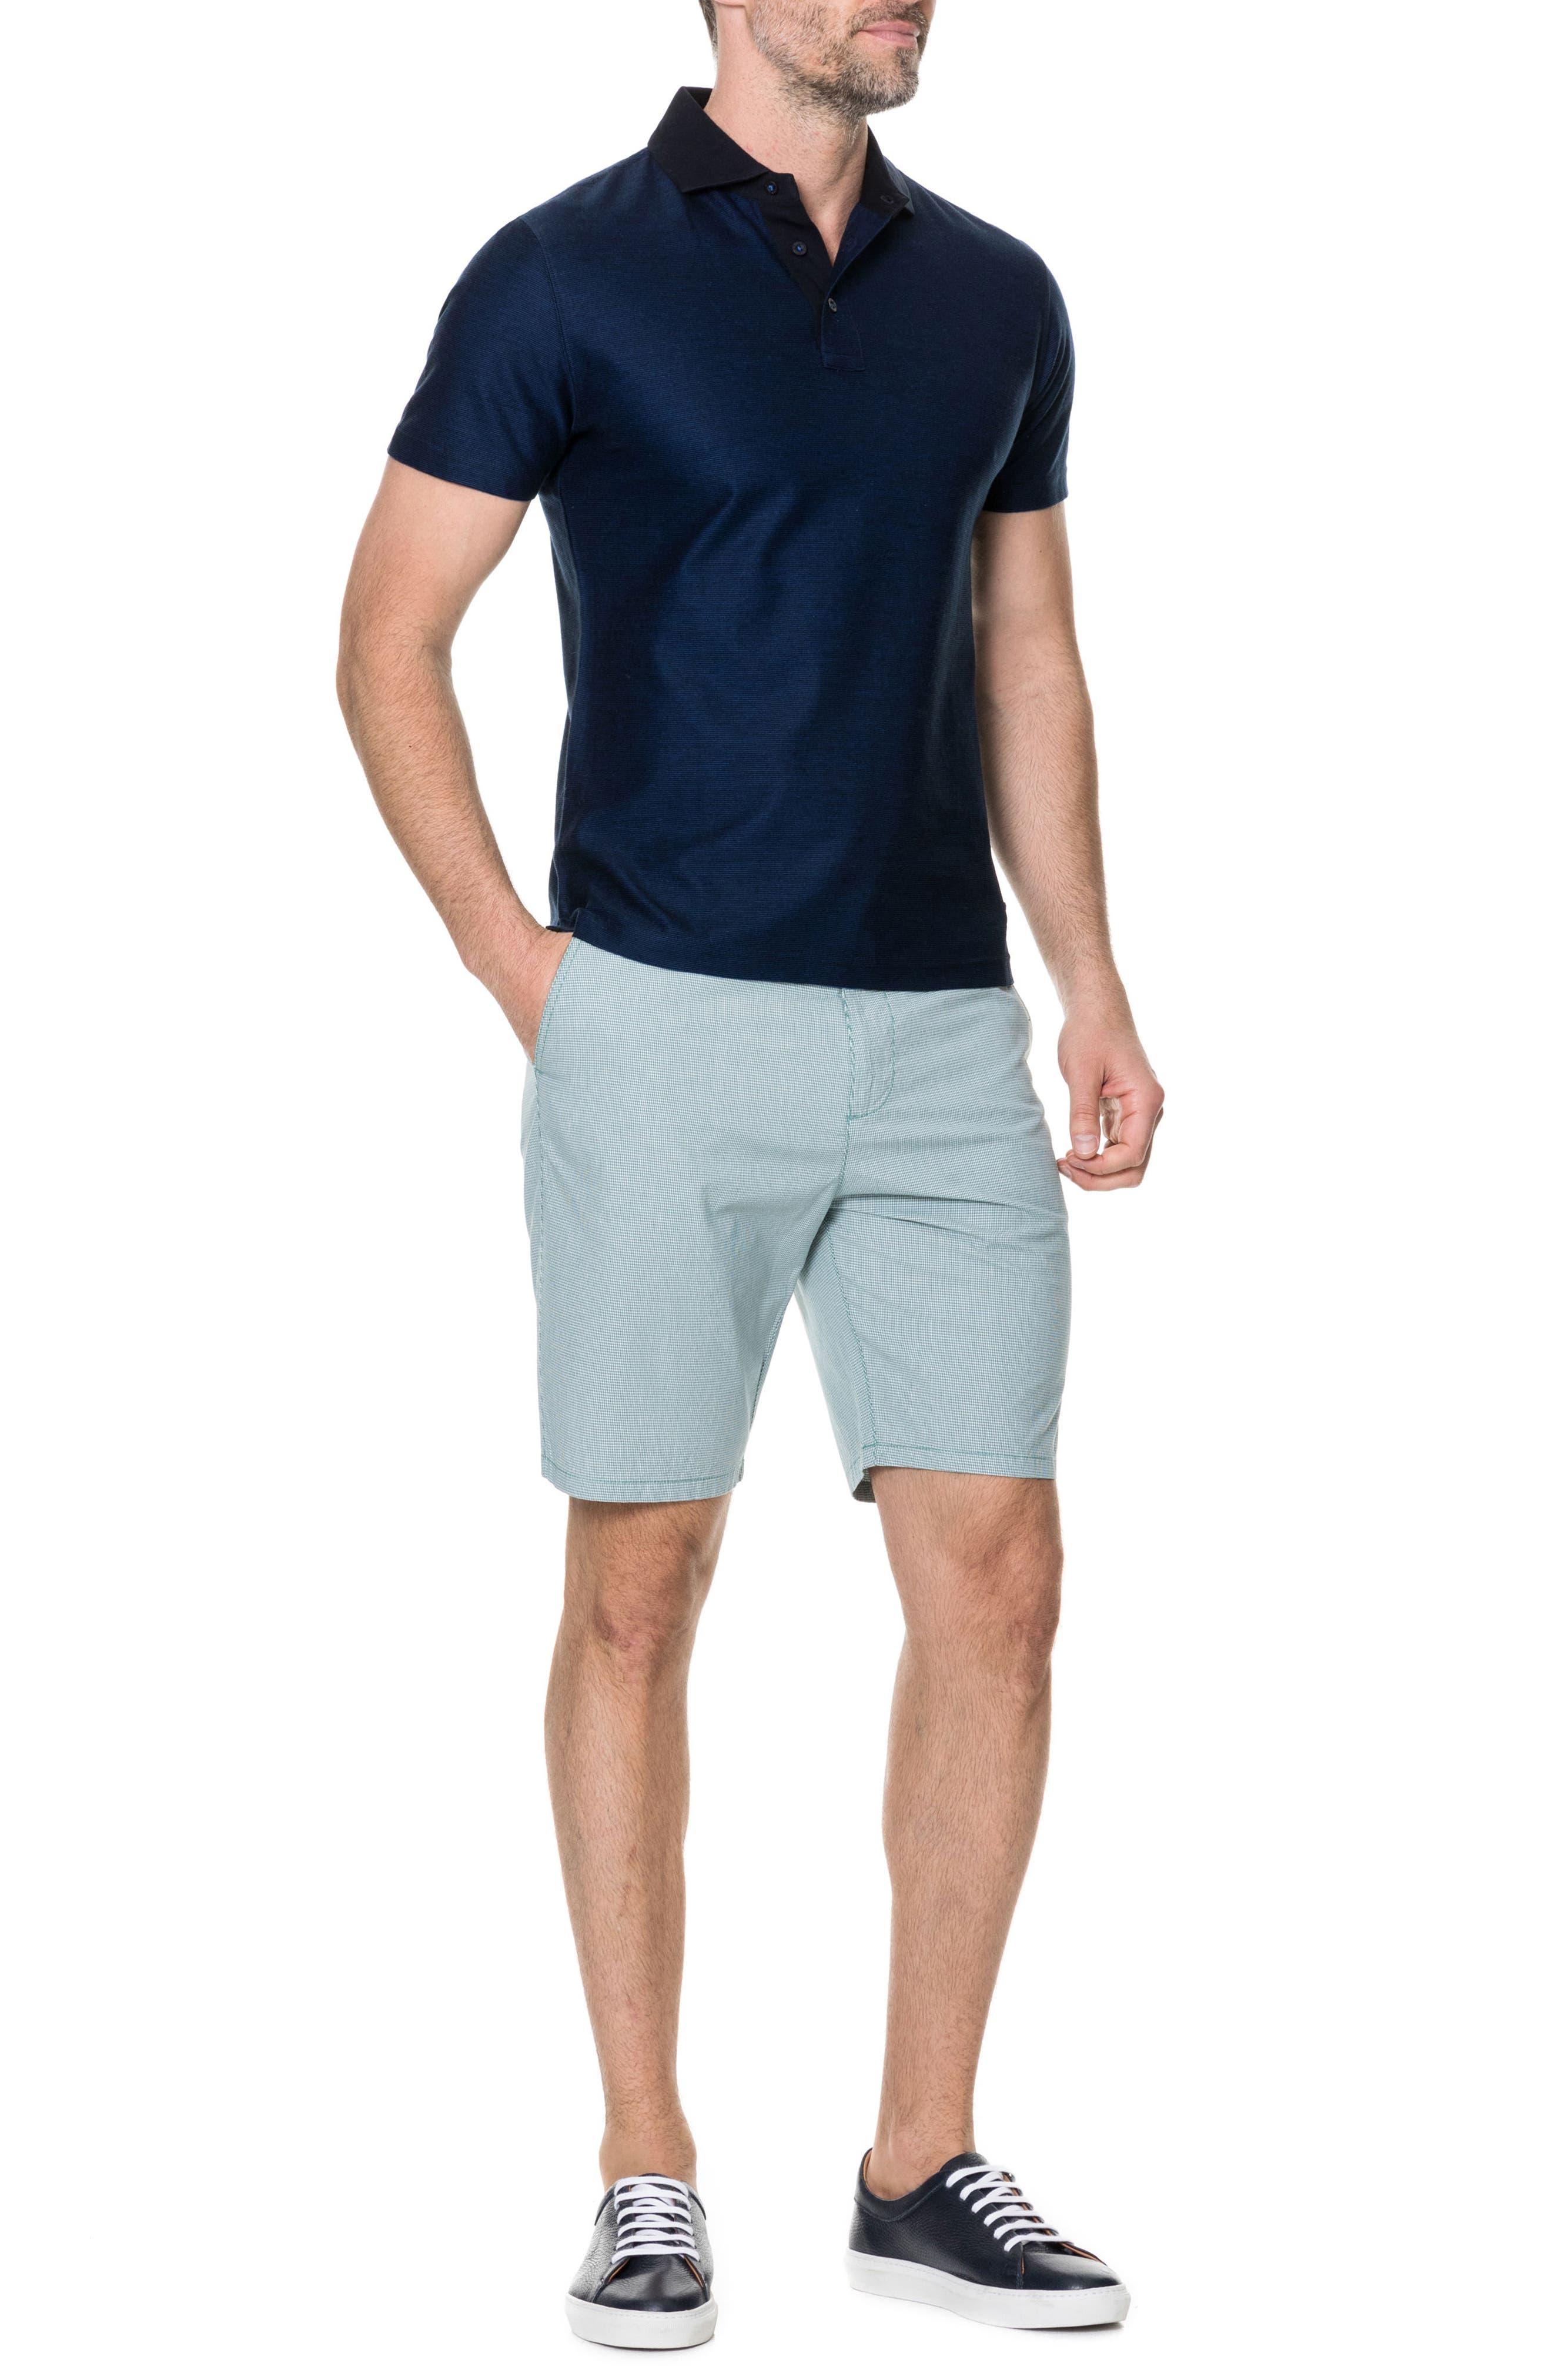 Caplestone Regular Fit Polo,                             Alternate thumbnail 5, color,                             401